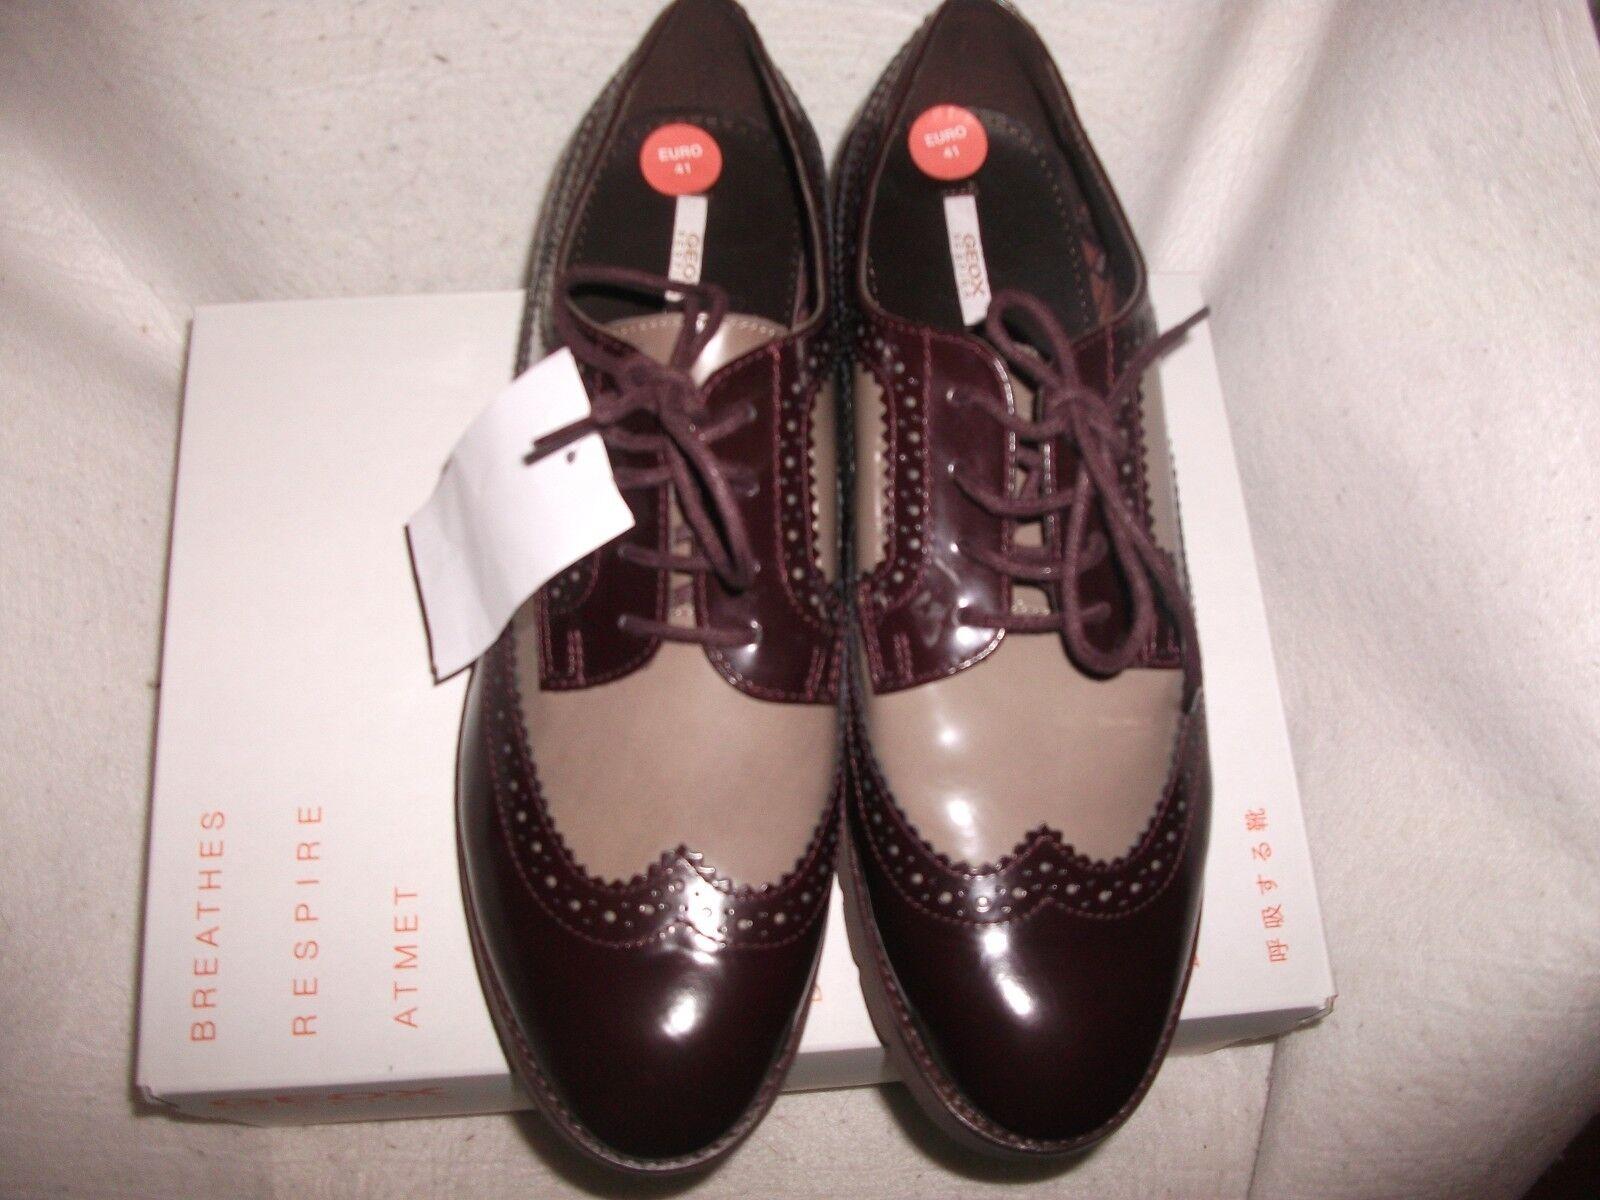 Damen Schuhe GEOX Gr 41 NEU